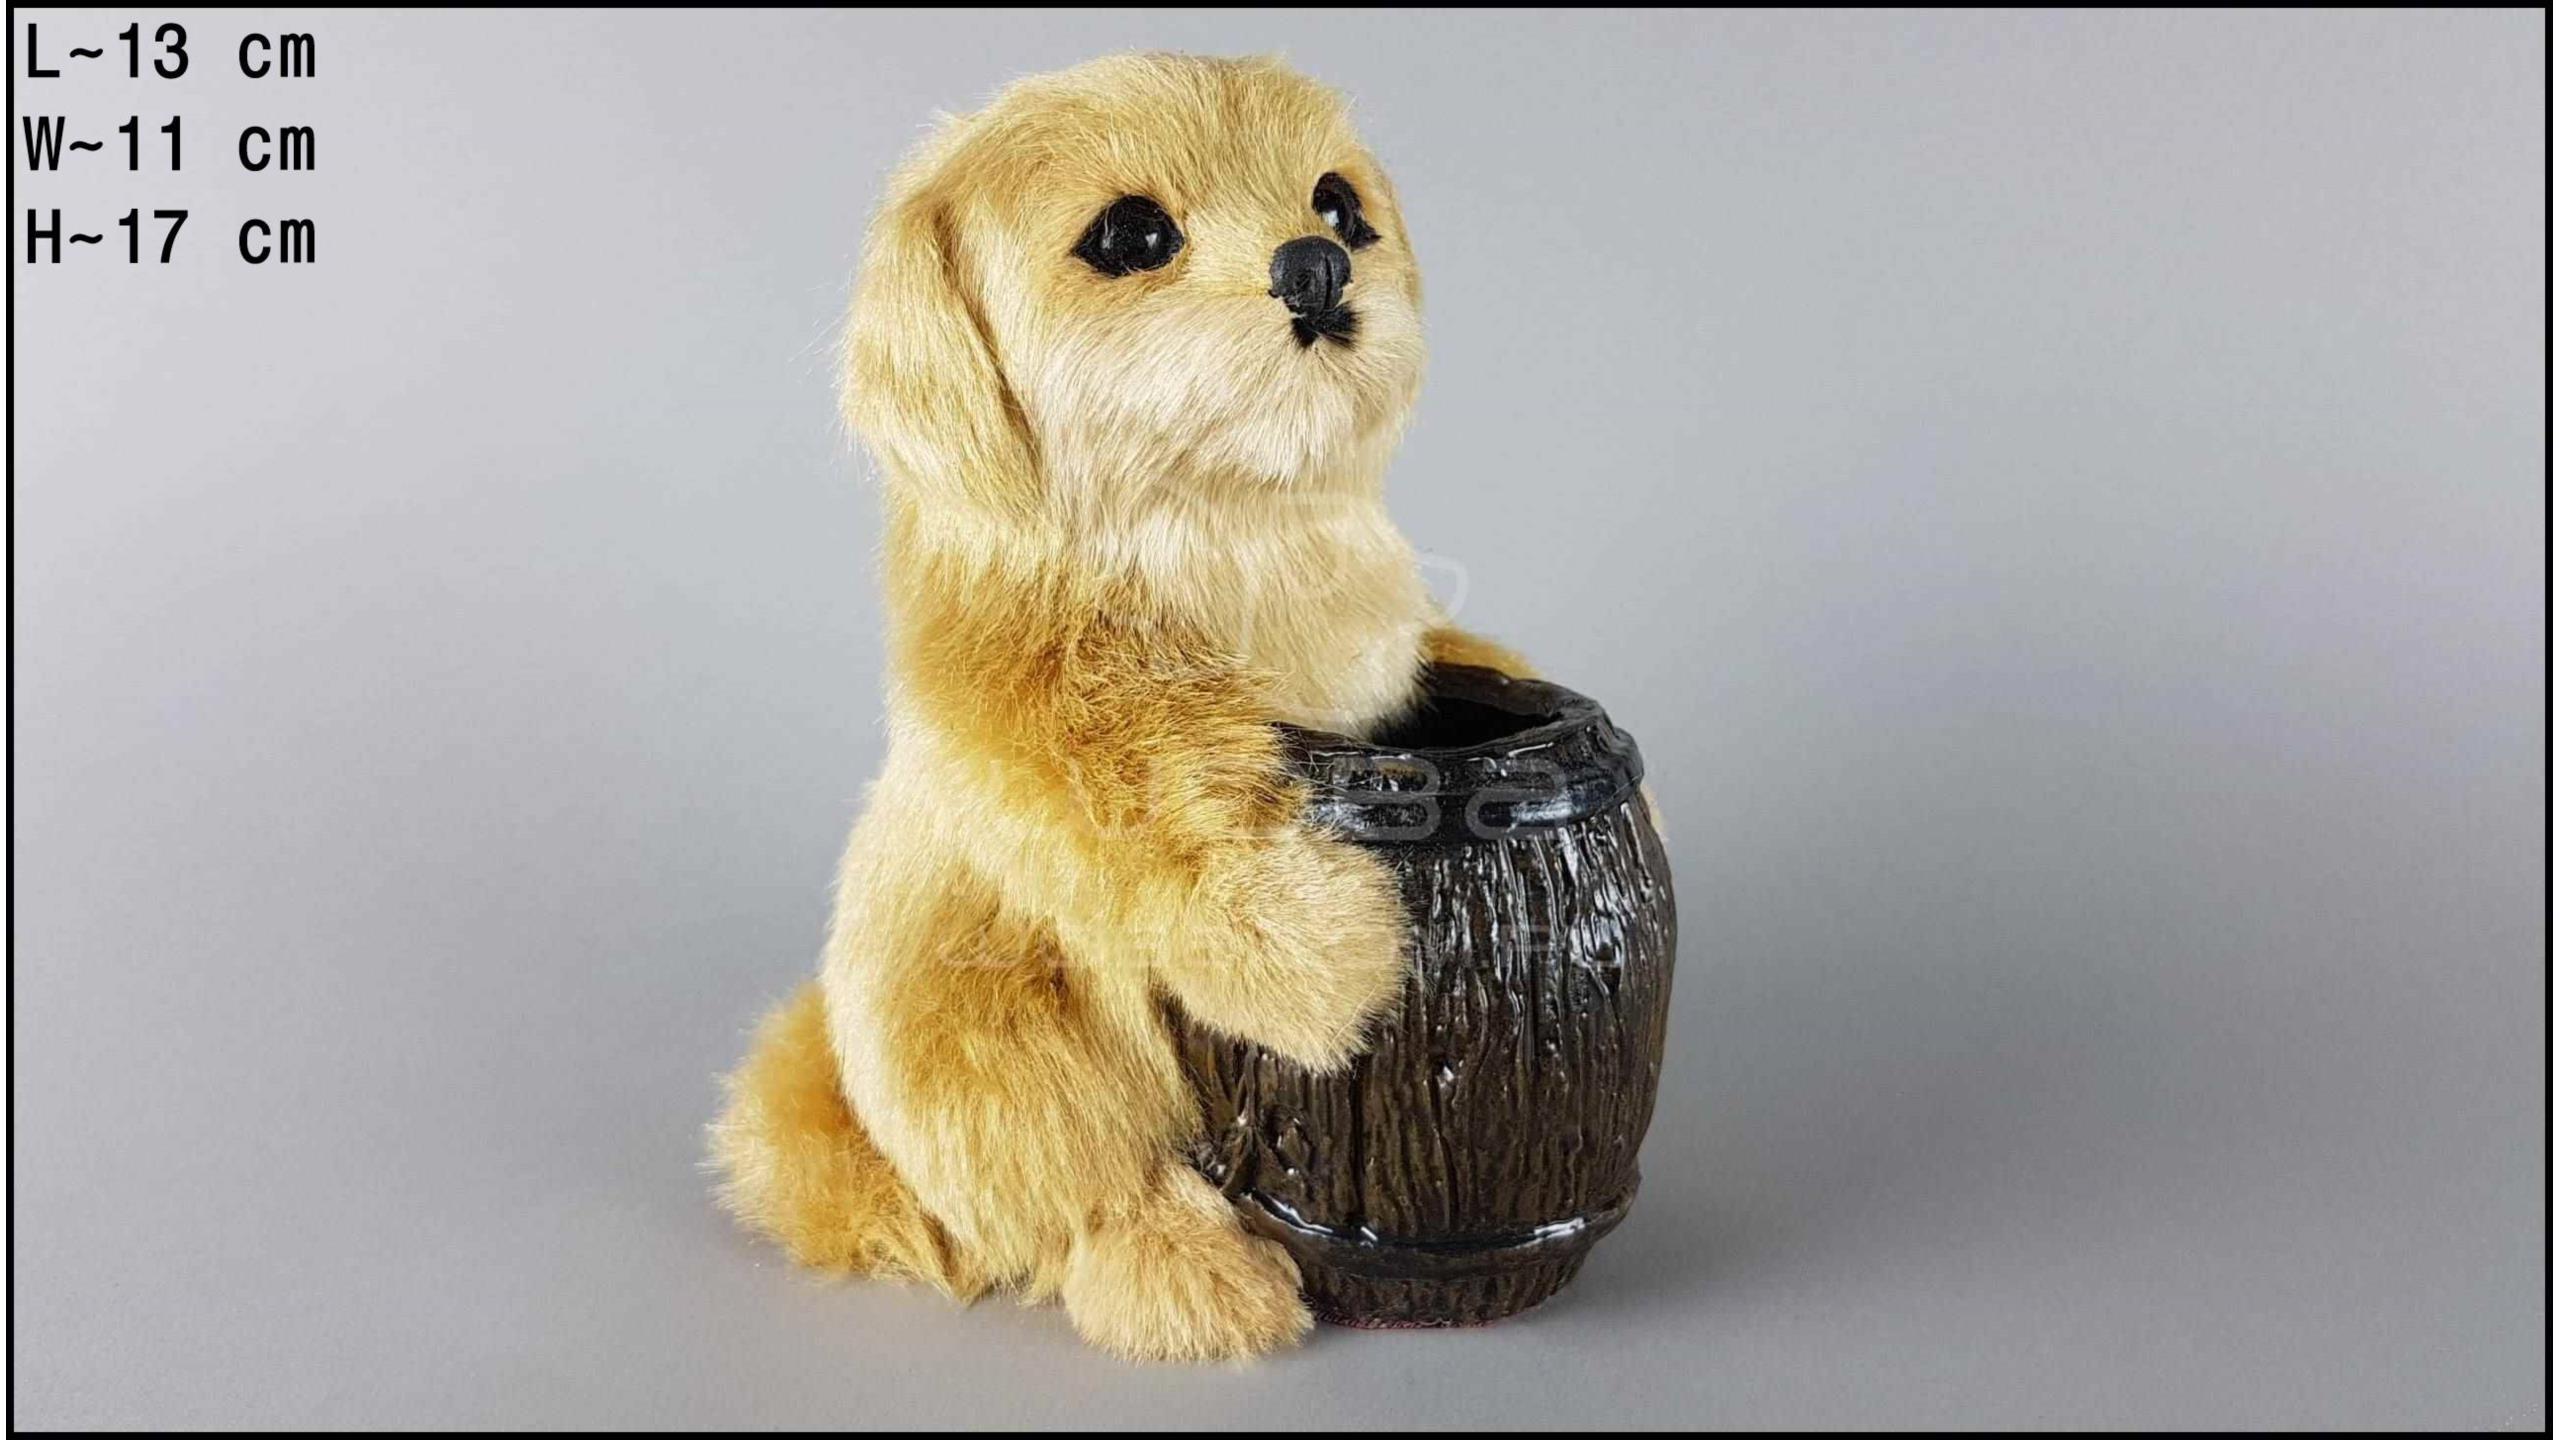 Pies z beczką - Labrador